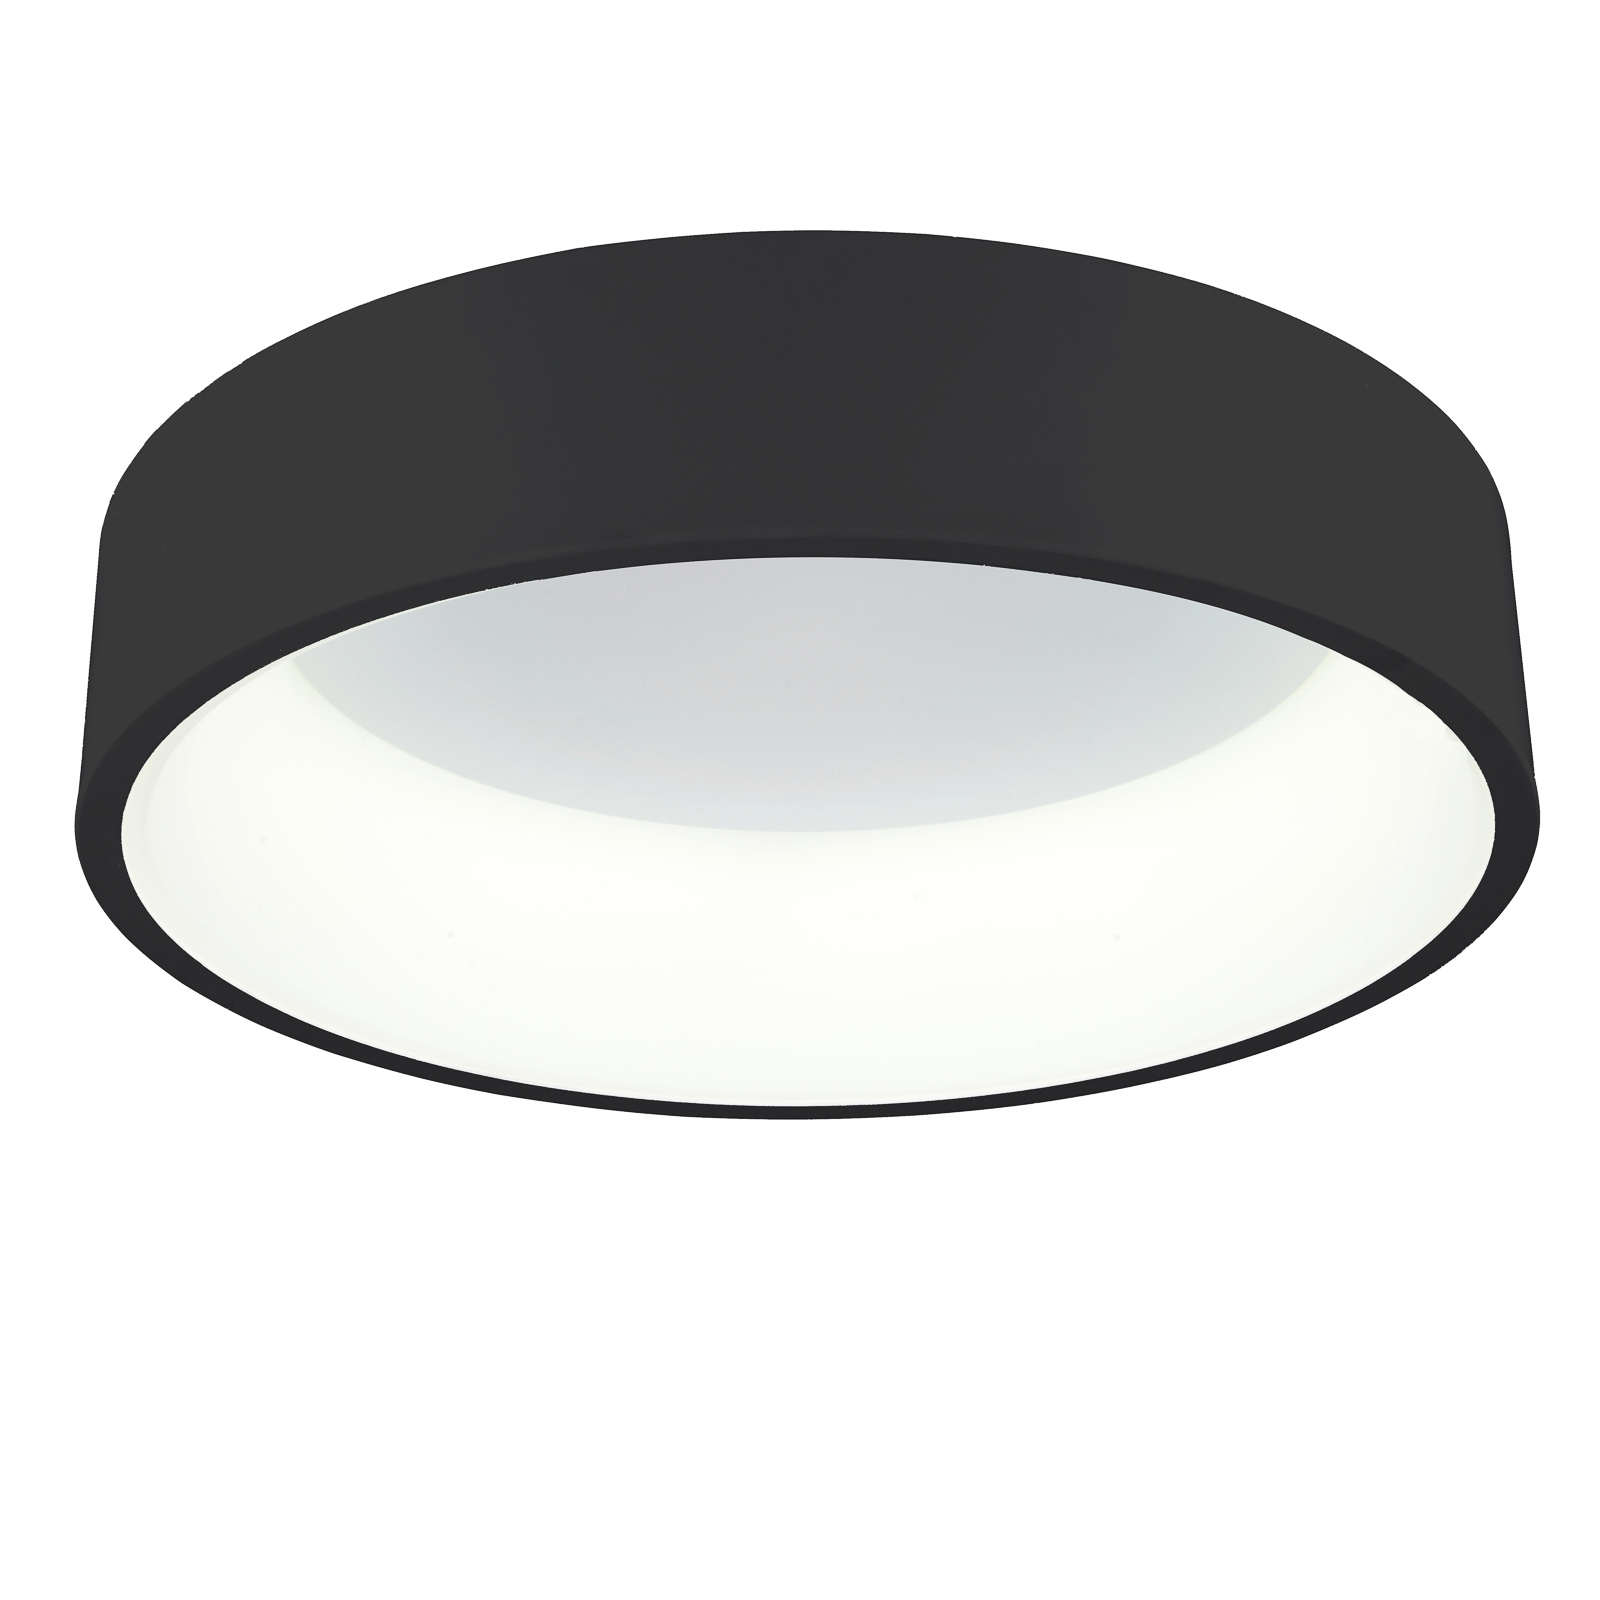 Arcchio Aleksi LED-loftlampe, Ø 45 cm, rund